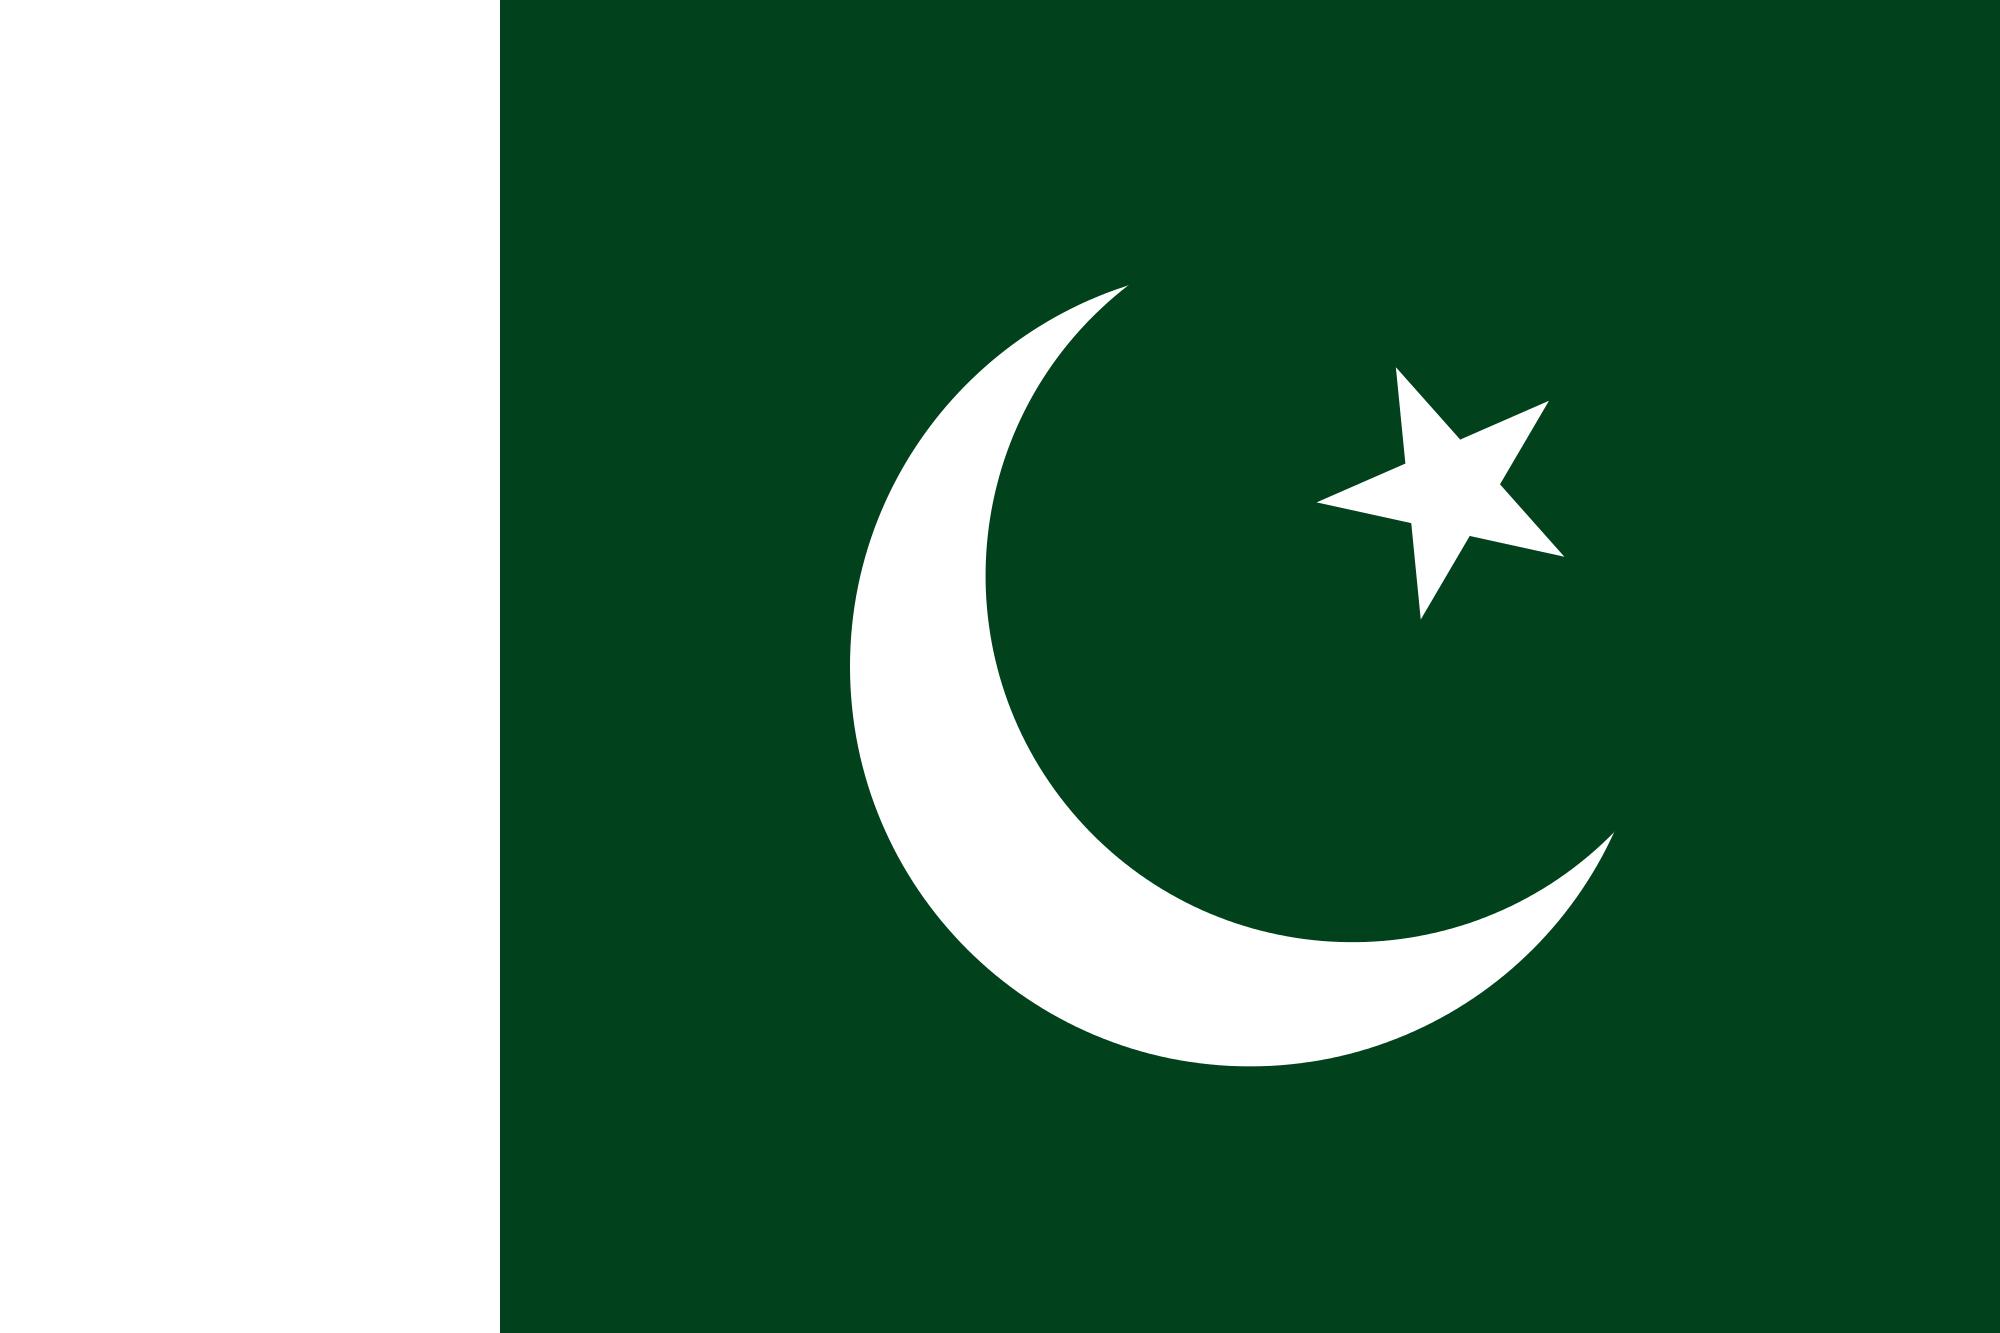 National Flag of Pakistan